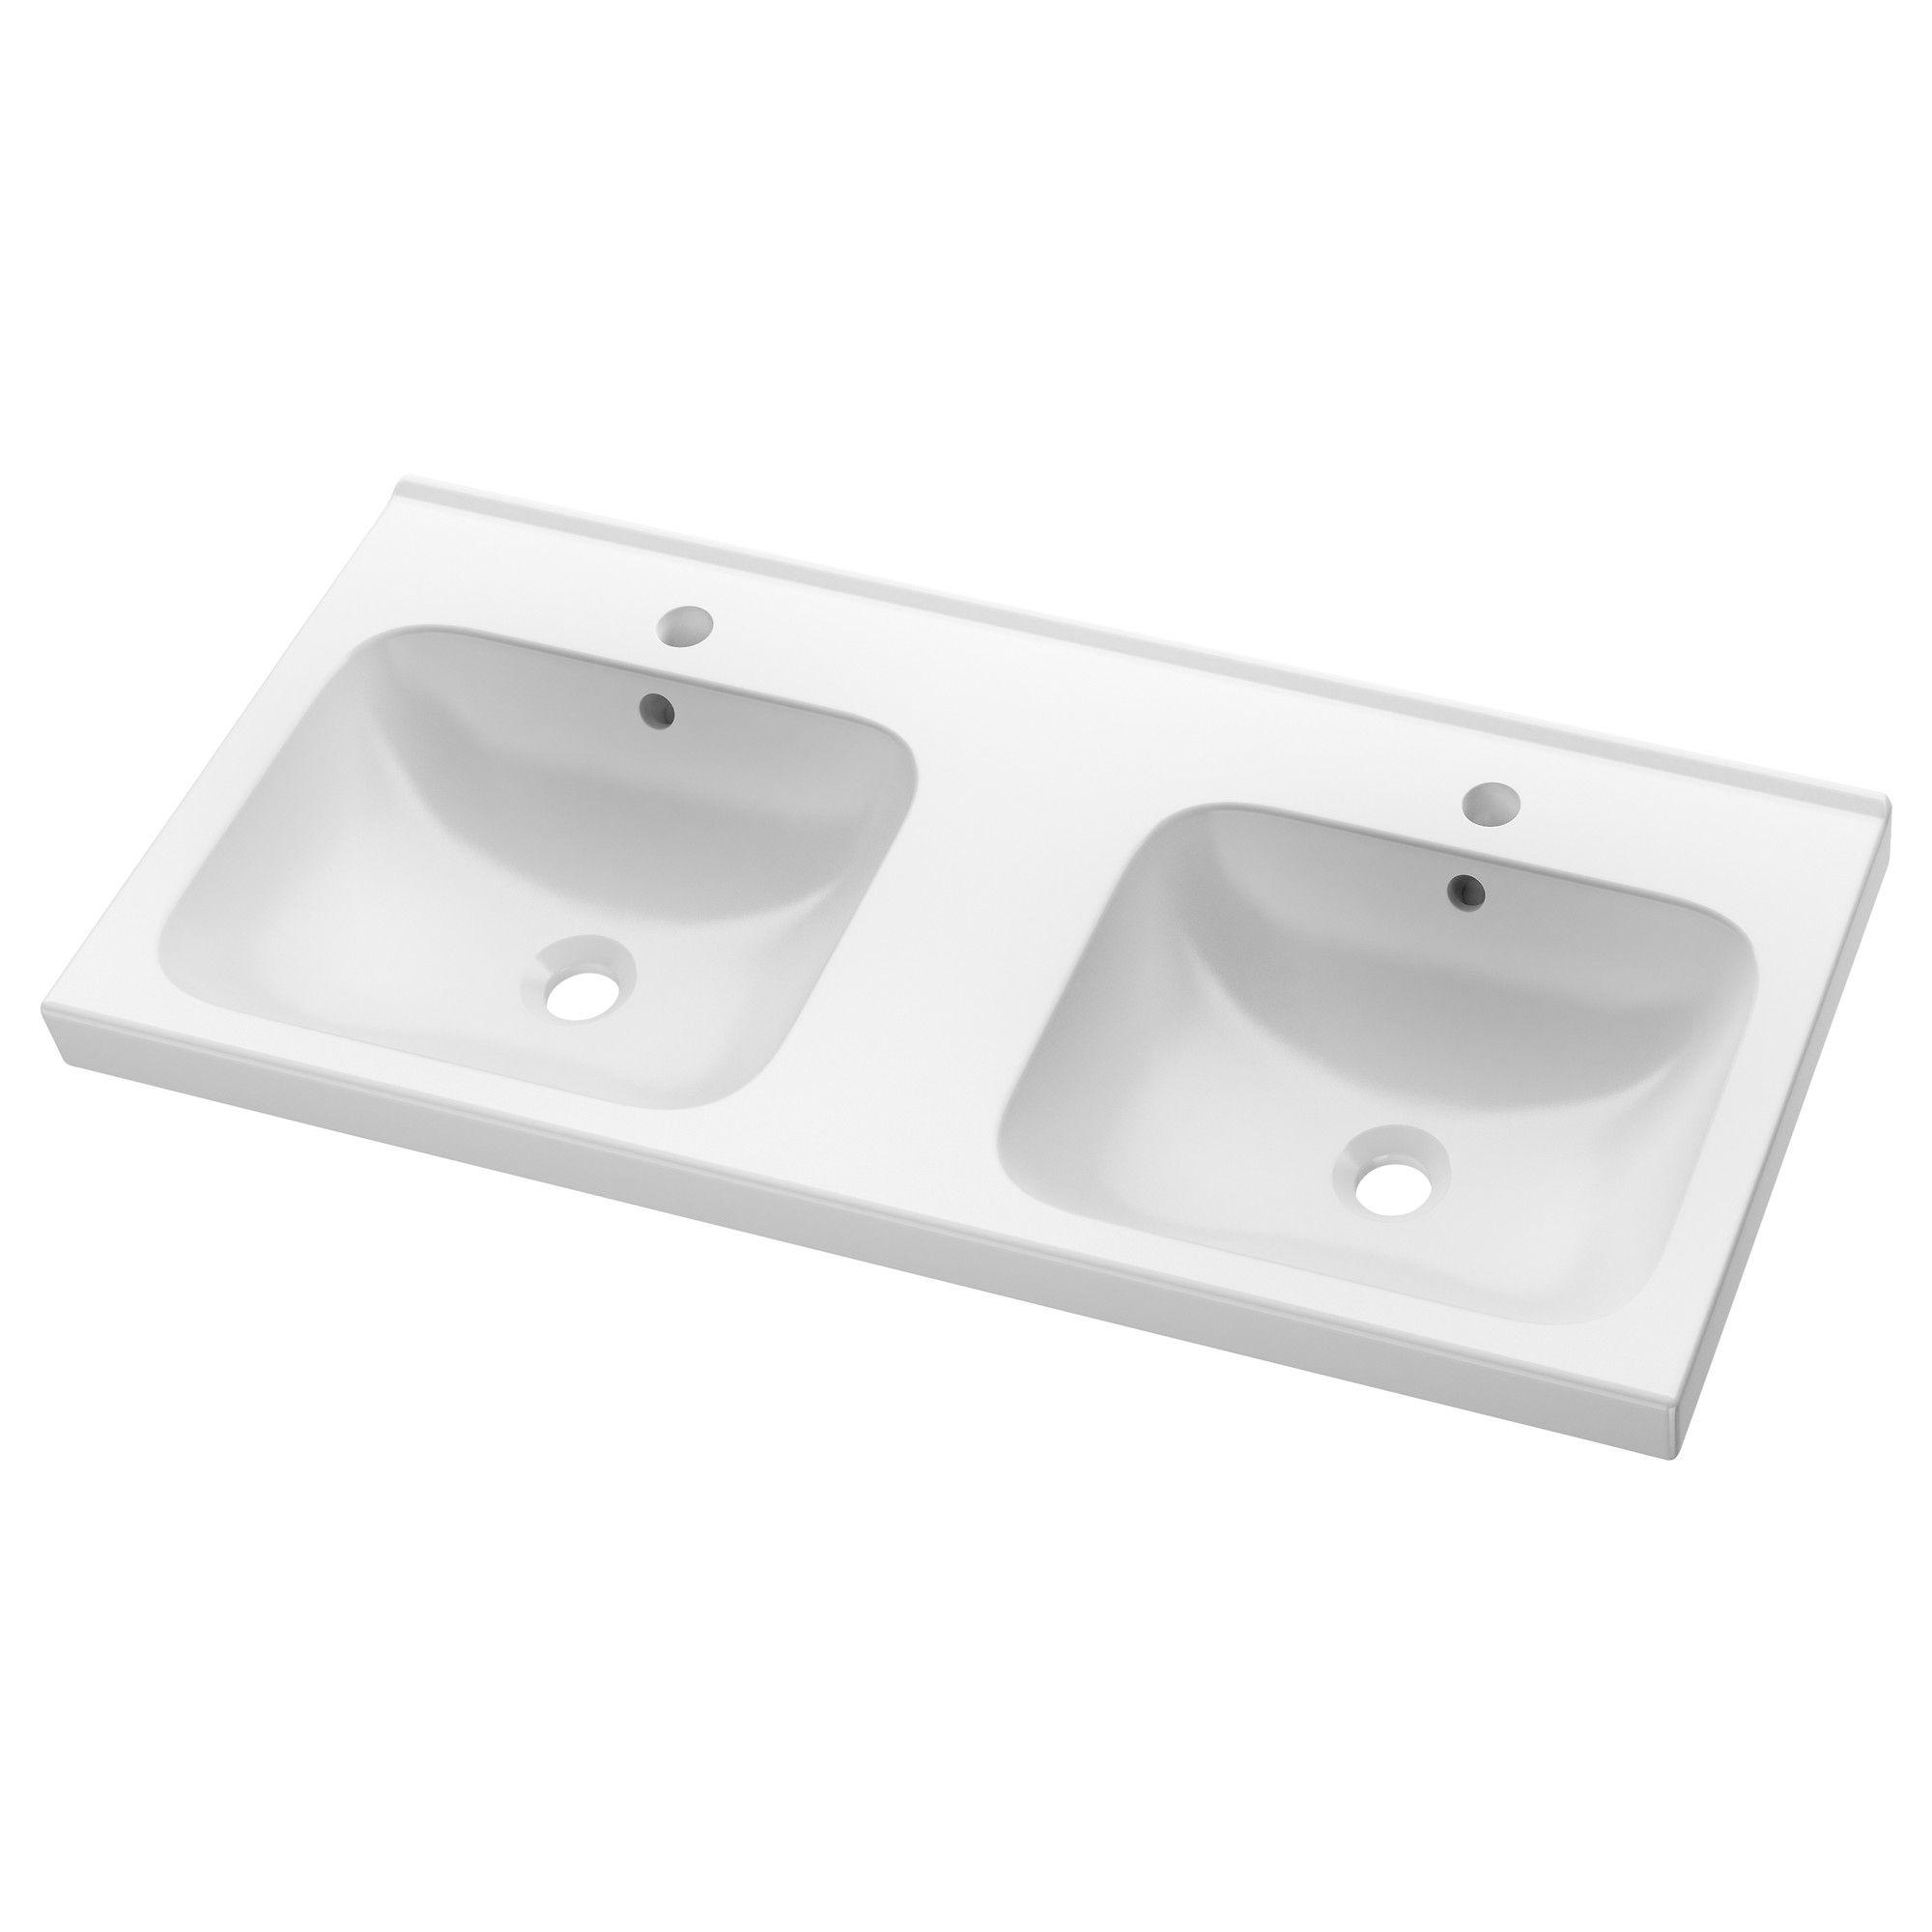 ODENSVIK Double Wash Basin 100x49x6 Cm